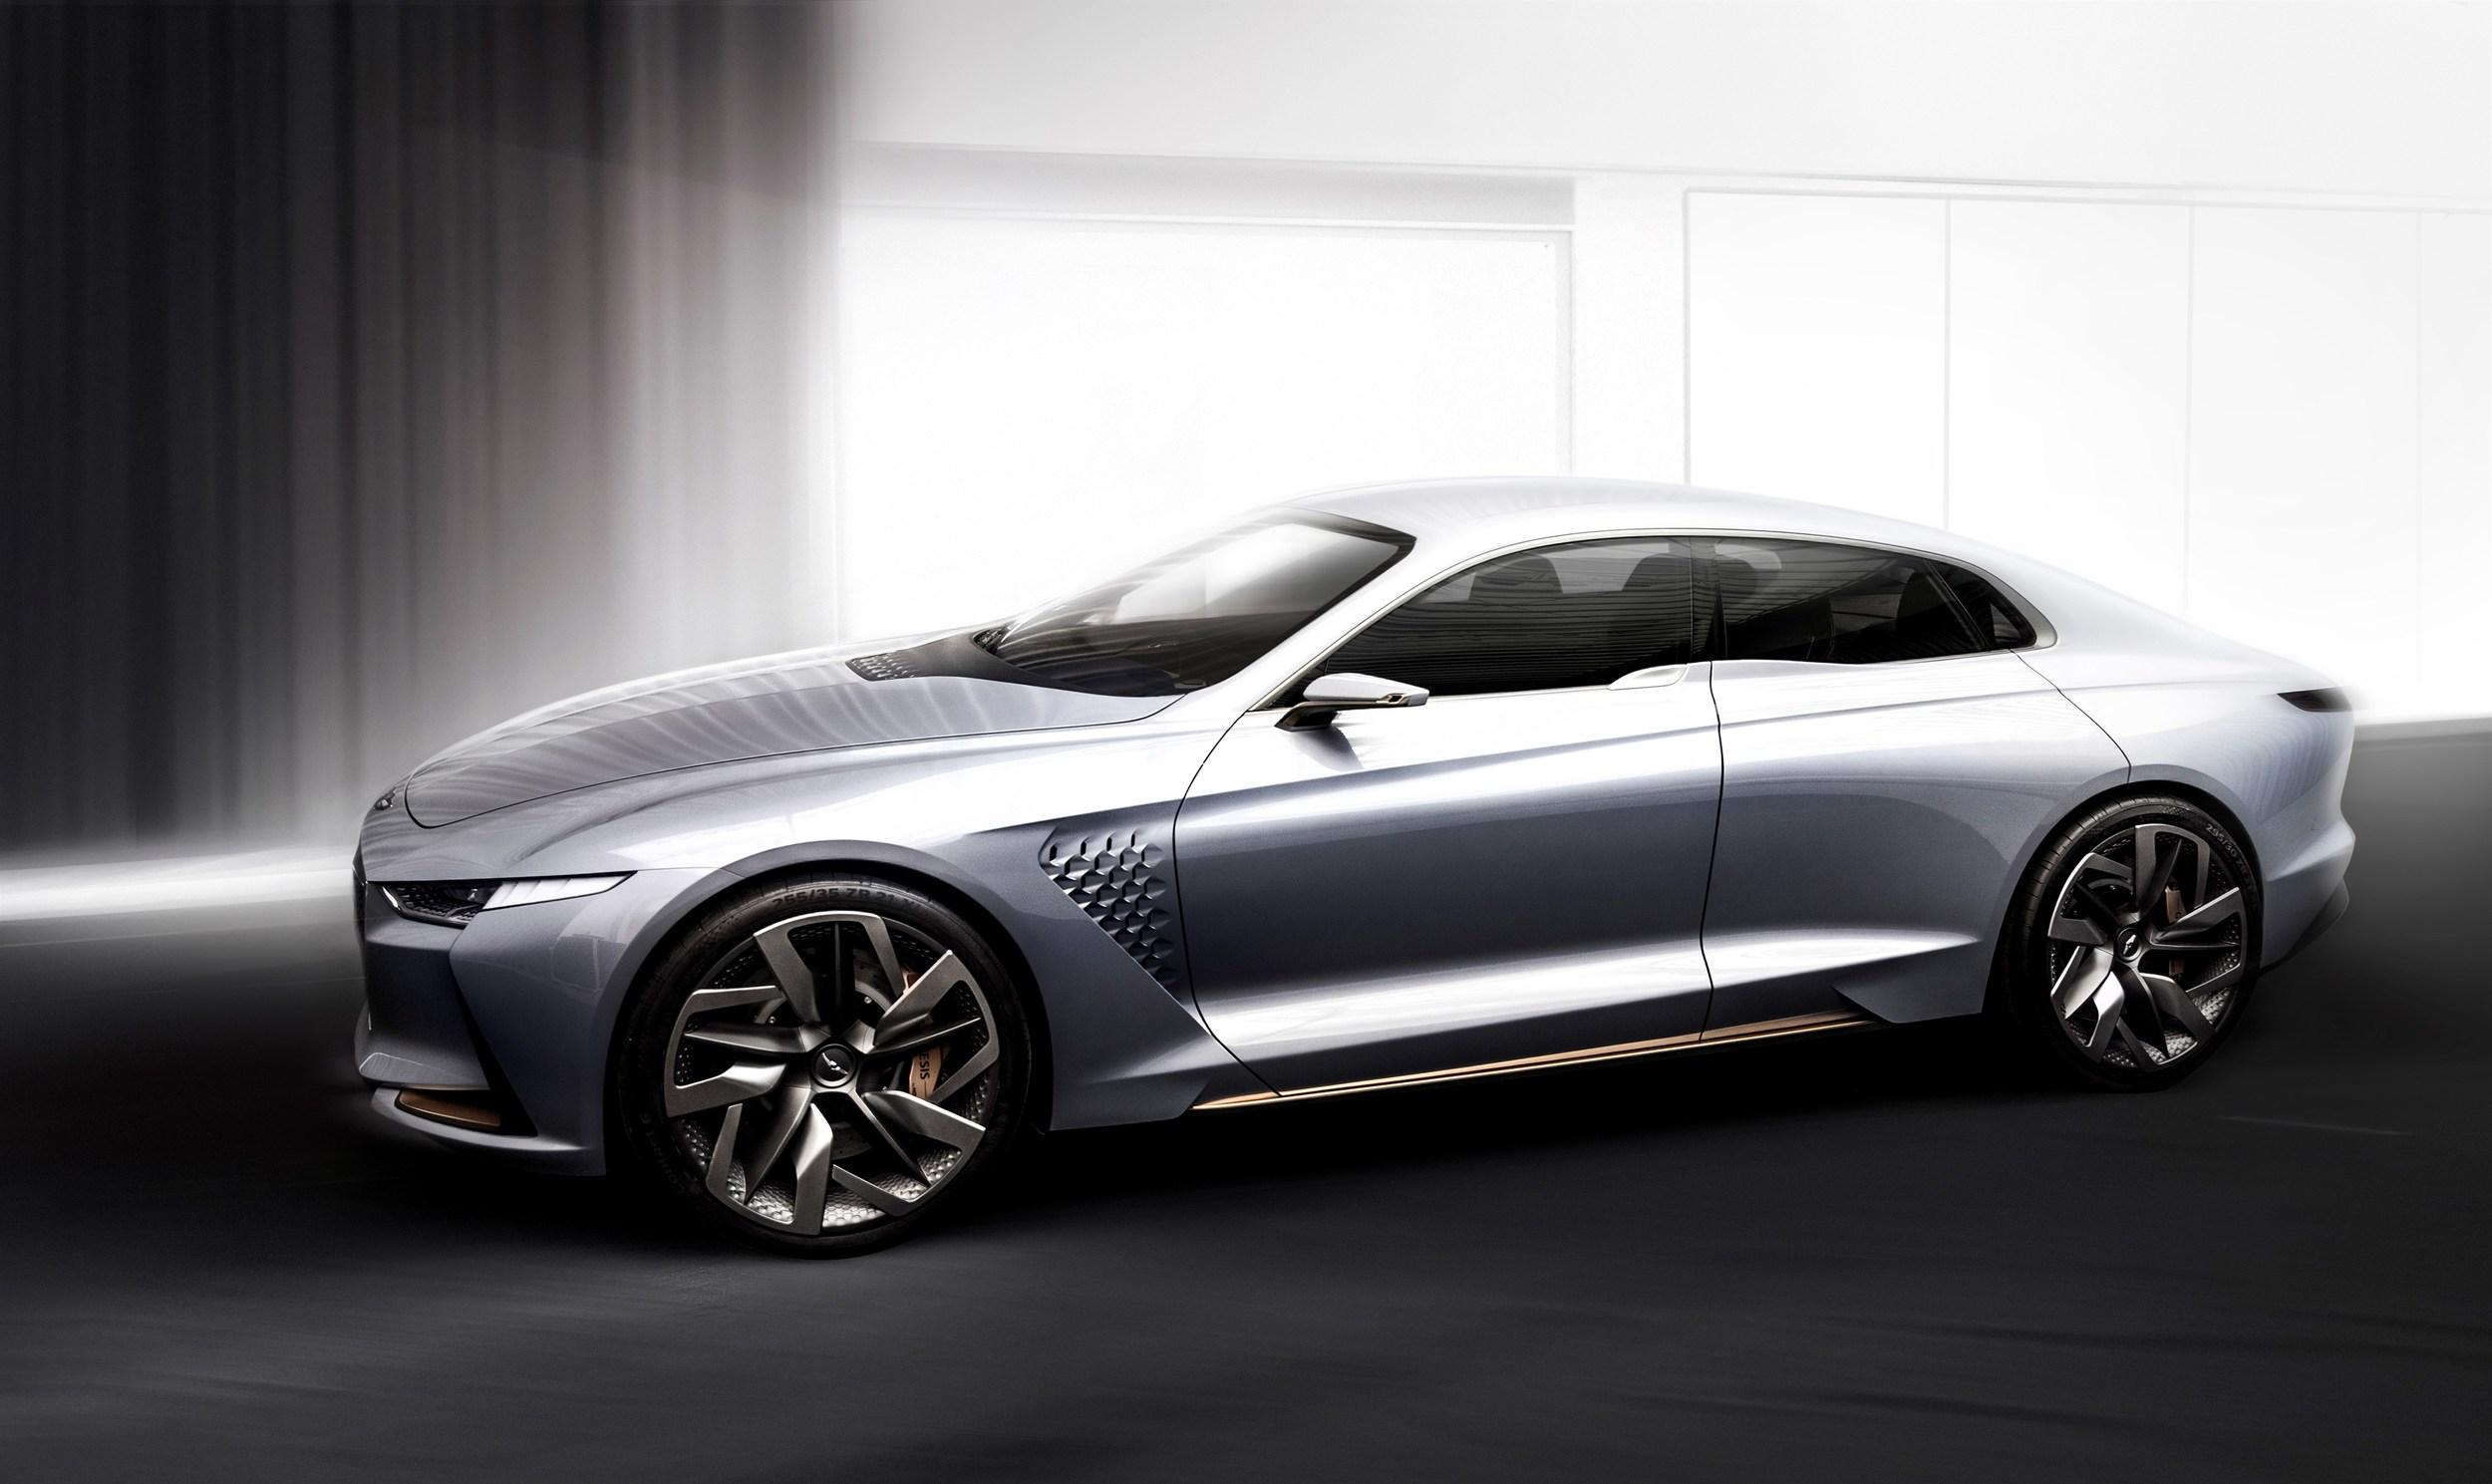 2016 Hyundai Genesis Coupe >> 2018 Genesis G70 Imagined by Brenthon Design - autoevolution